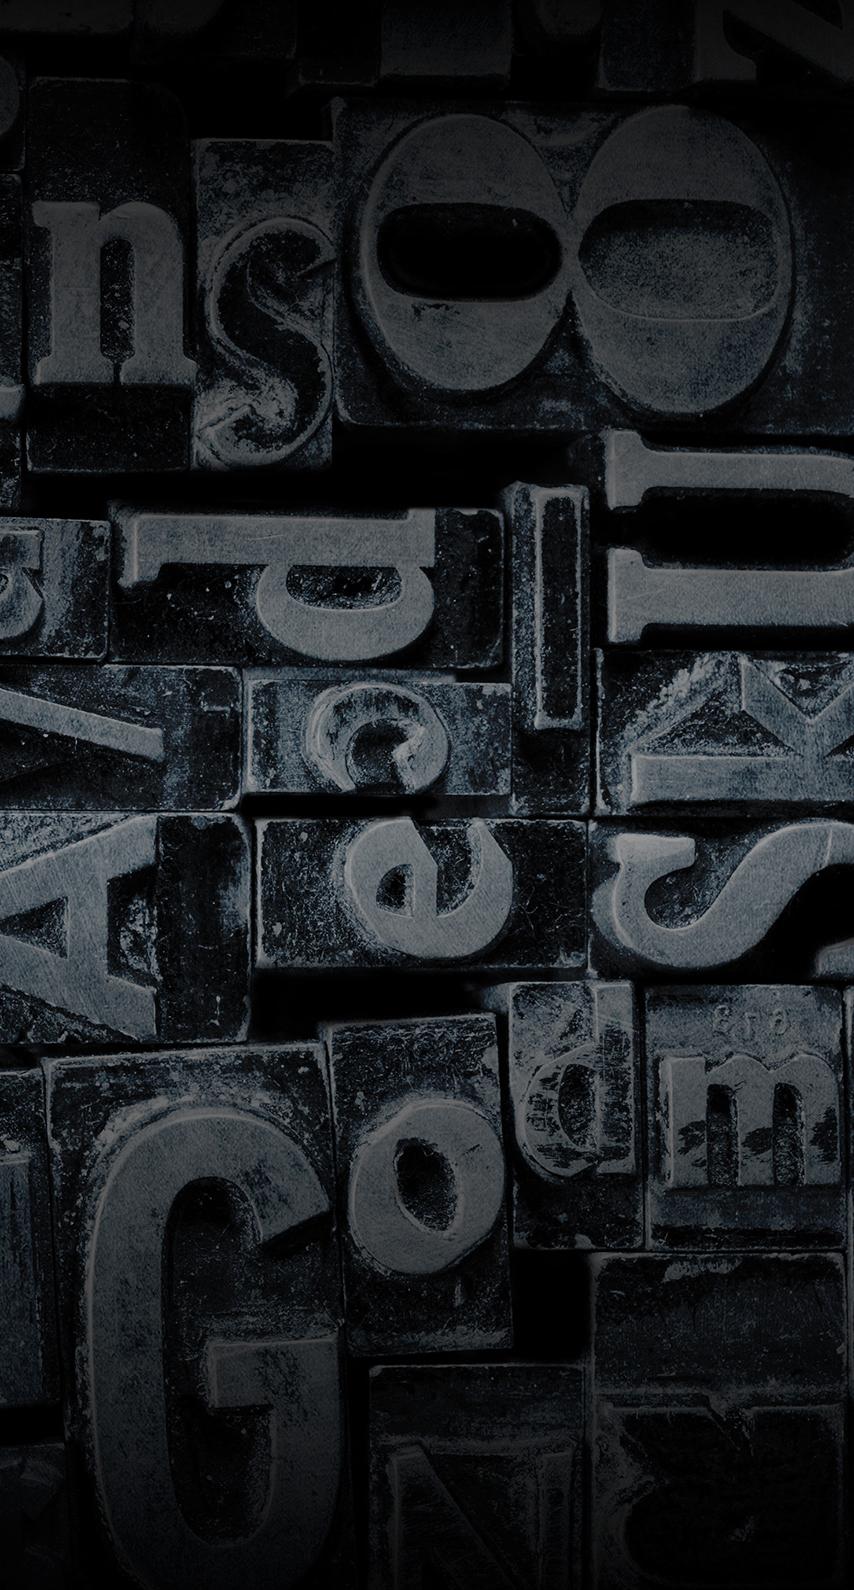 steel, text